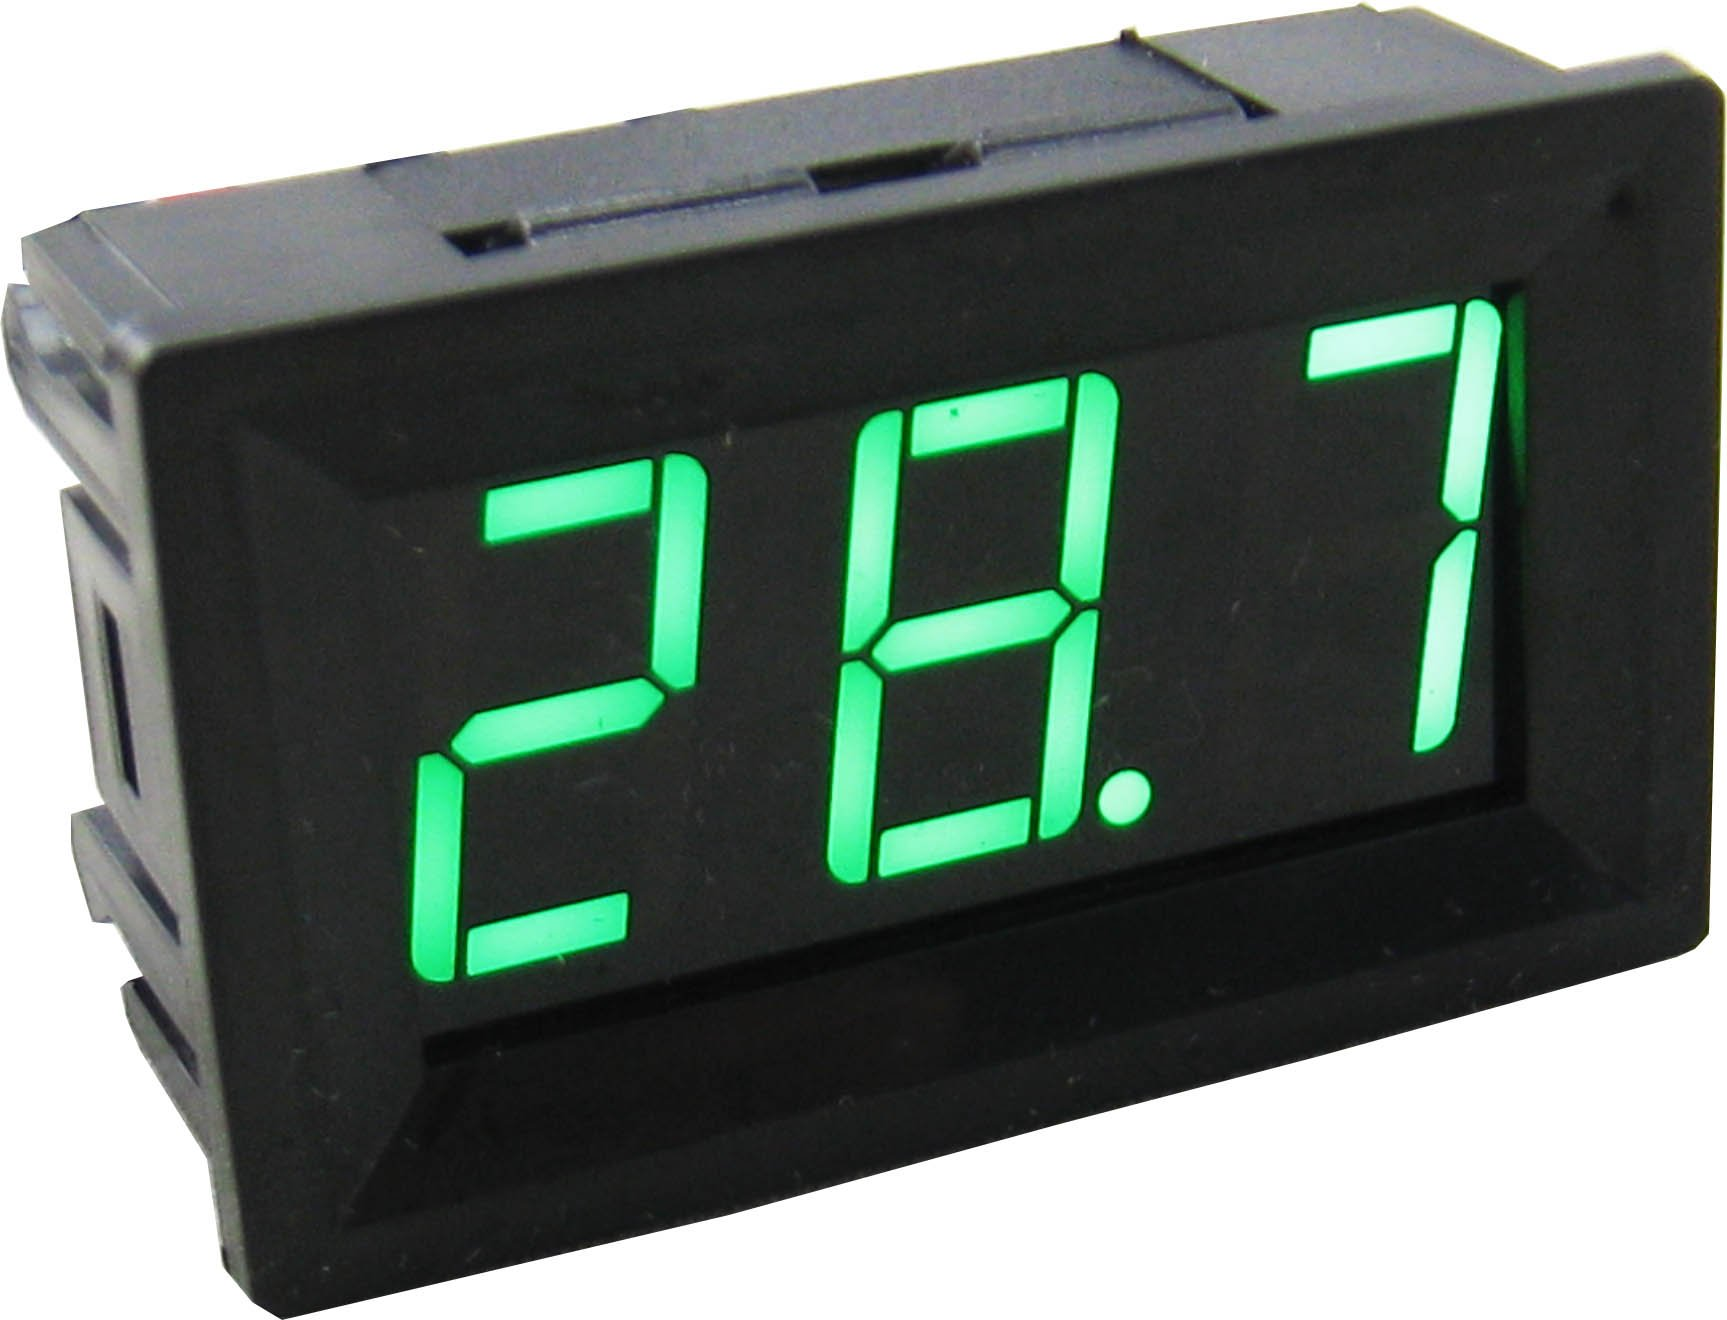 Yeeco -50-110 °C Degrees Celsius Digital Thermometer Car/Motor Temperature Panel Meter Temp Gauge Monitor Green Led Display with Waterproof B3950-10k Probe Sensor DC 12V Black Shell